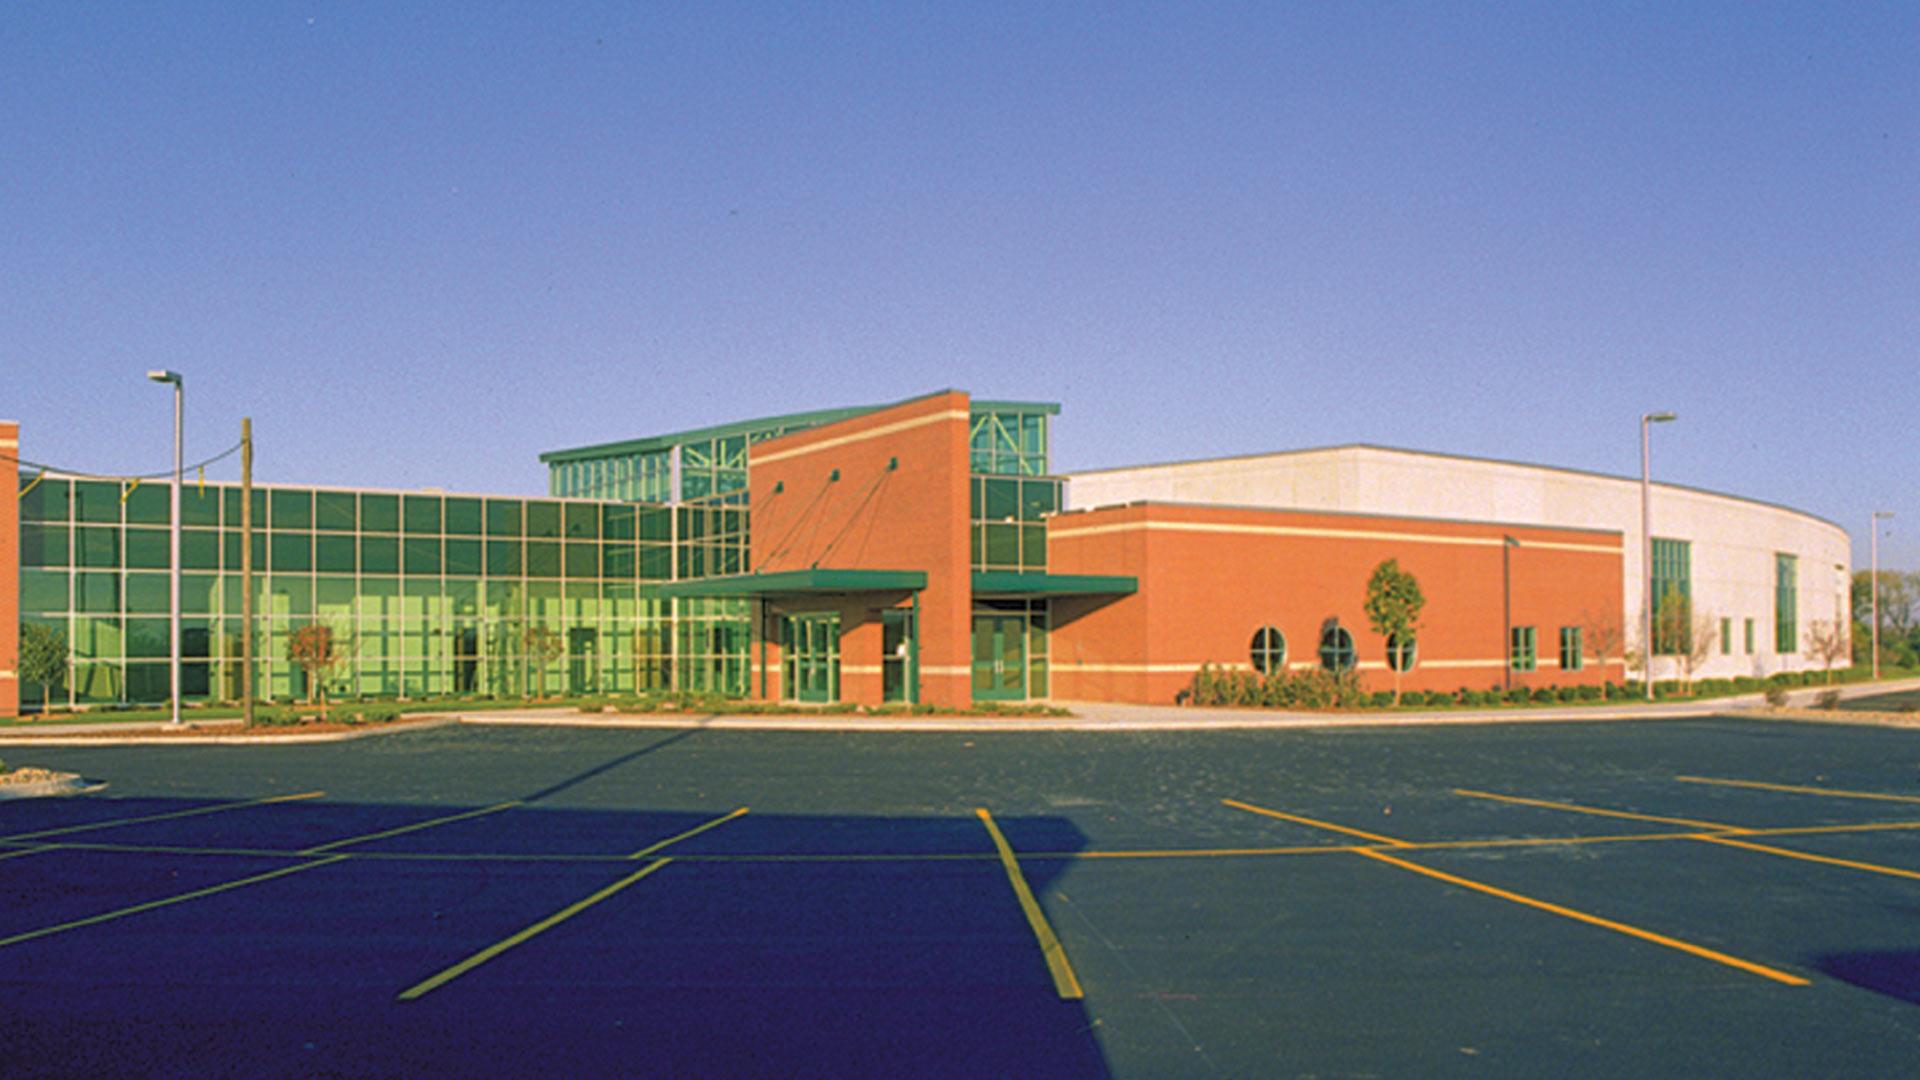 Northern Illinois Medical Center Health Bridge Fitness Center